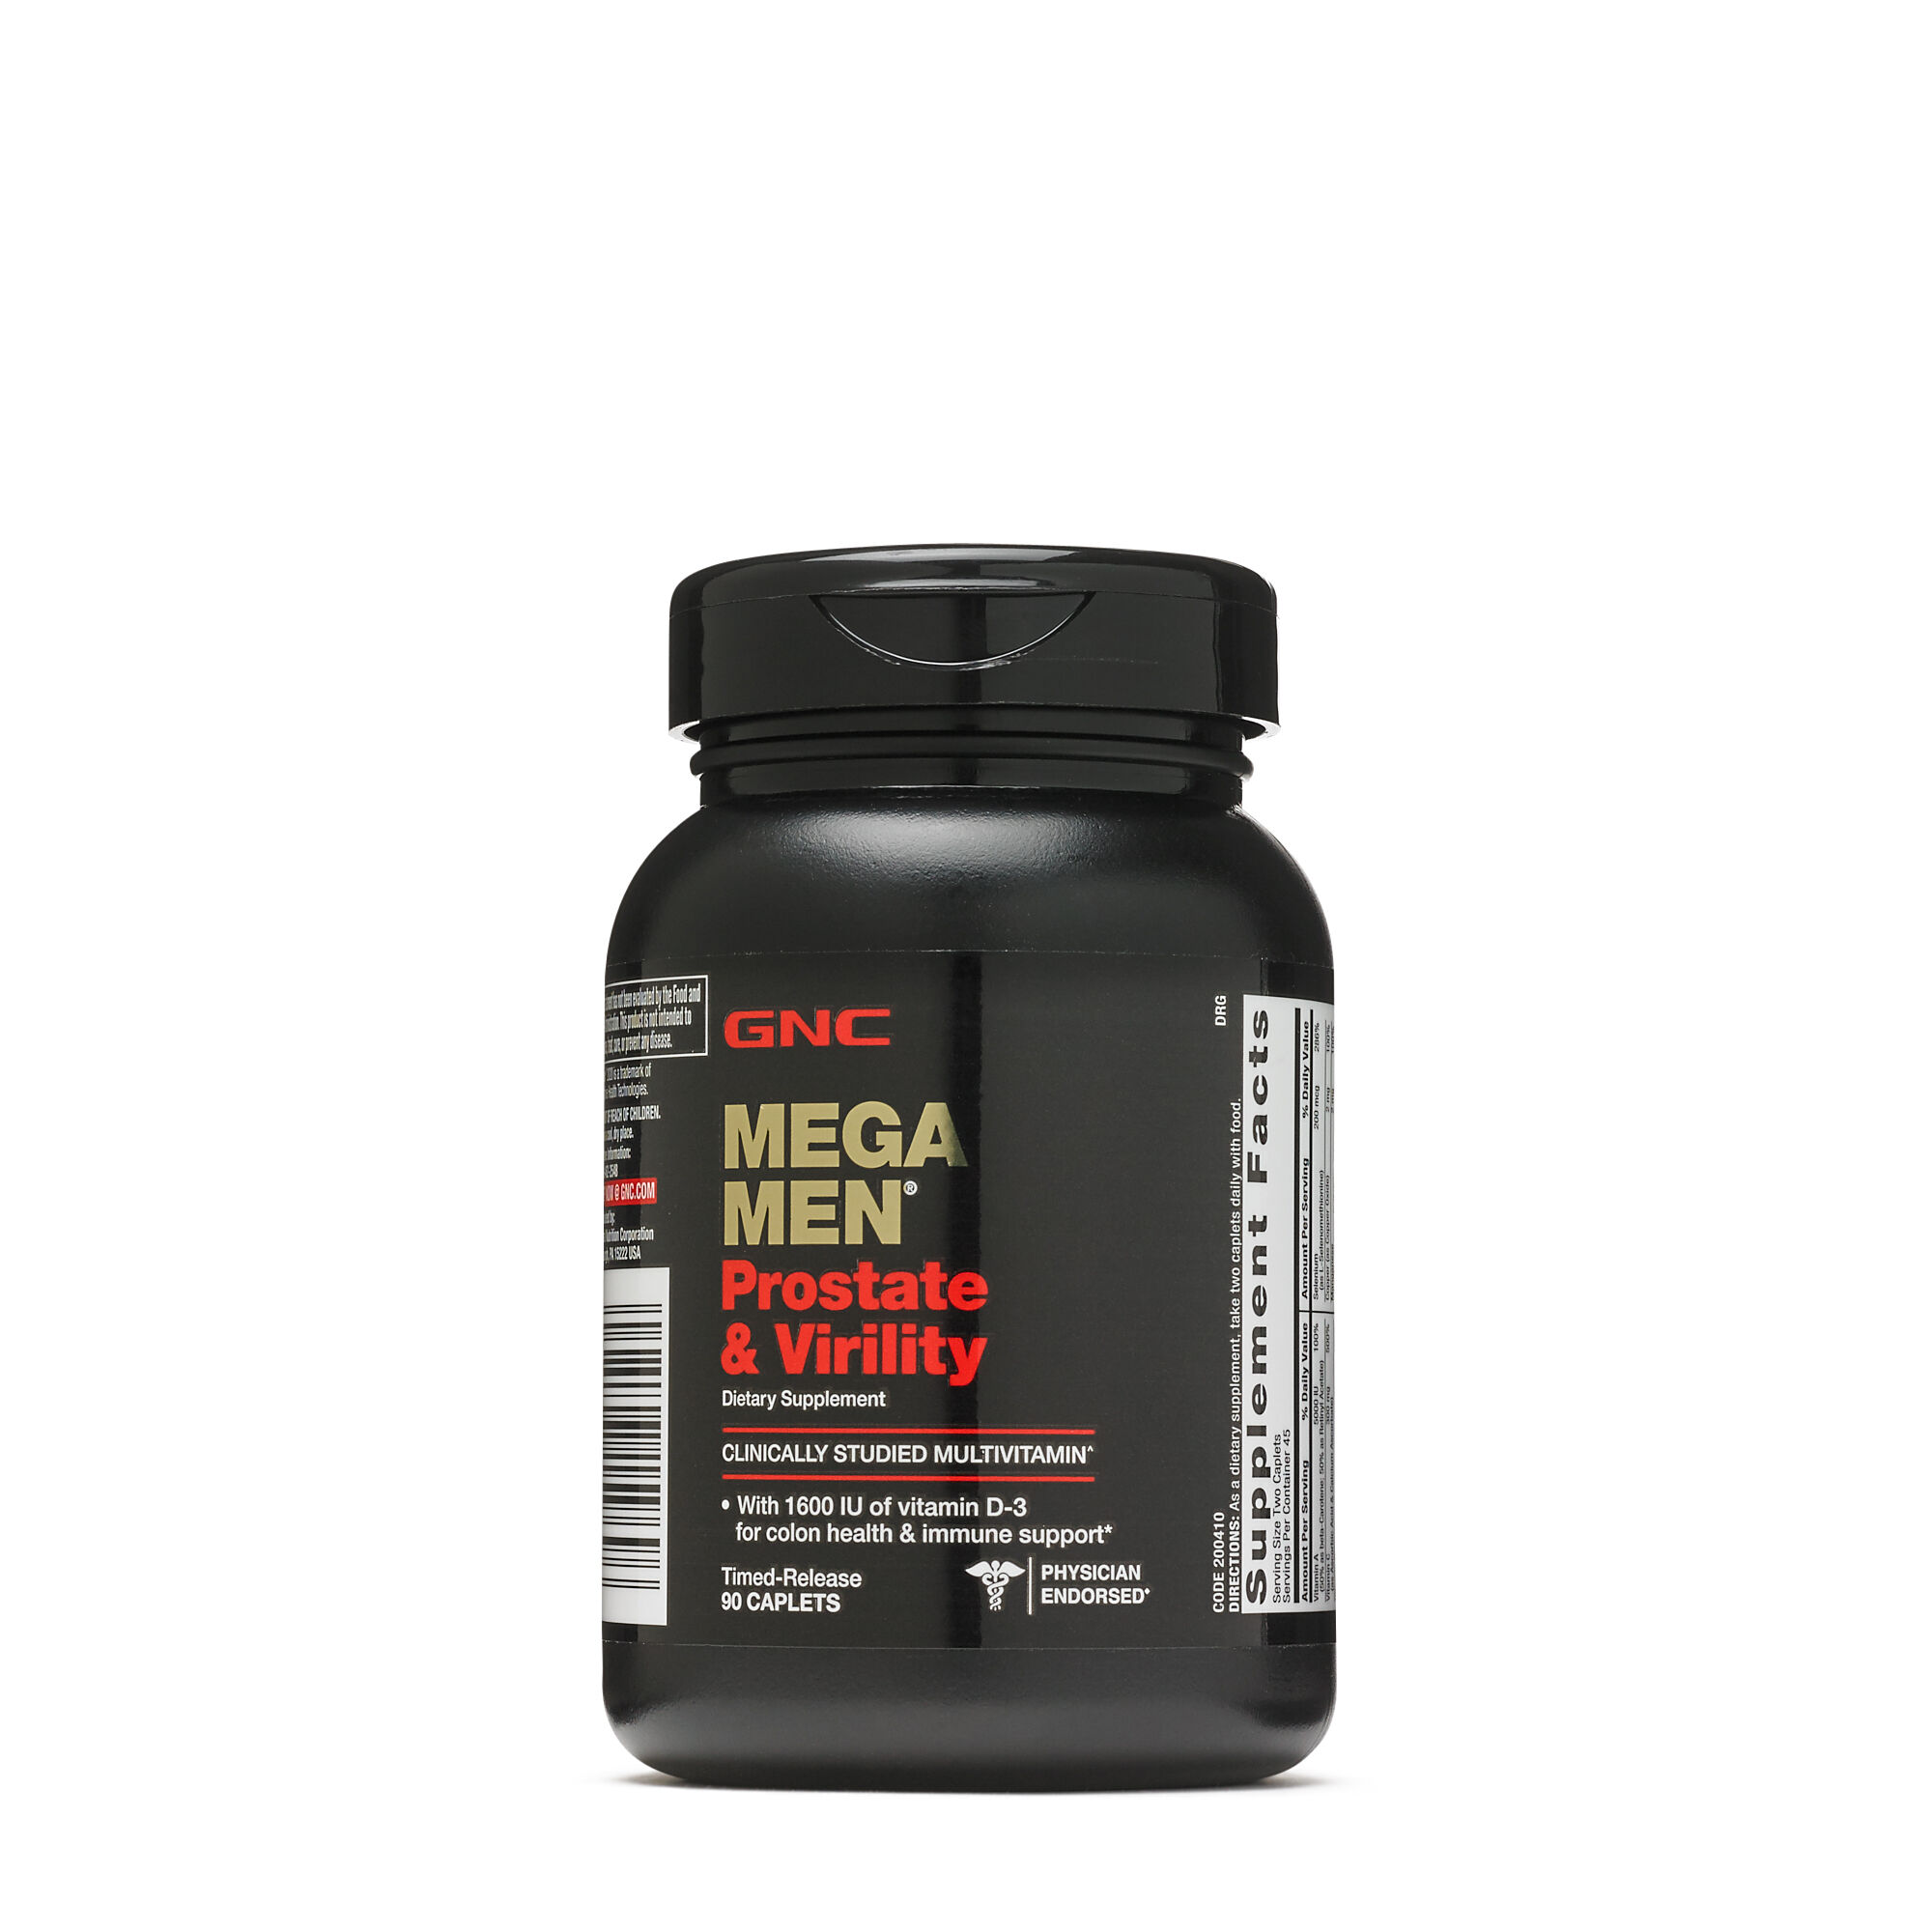 Gnc vitamins for men sexual health